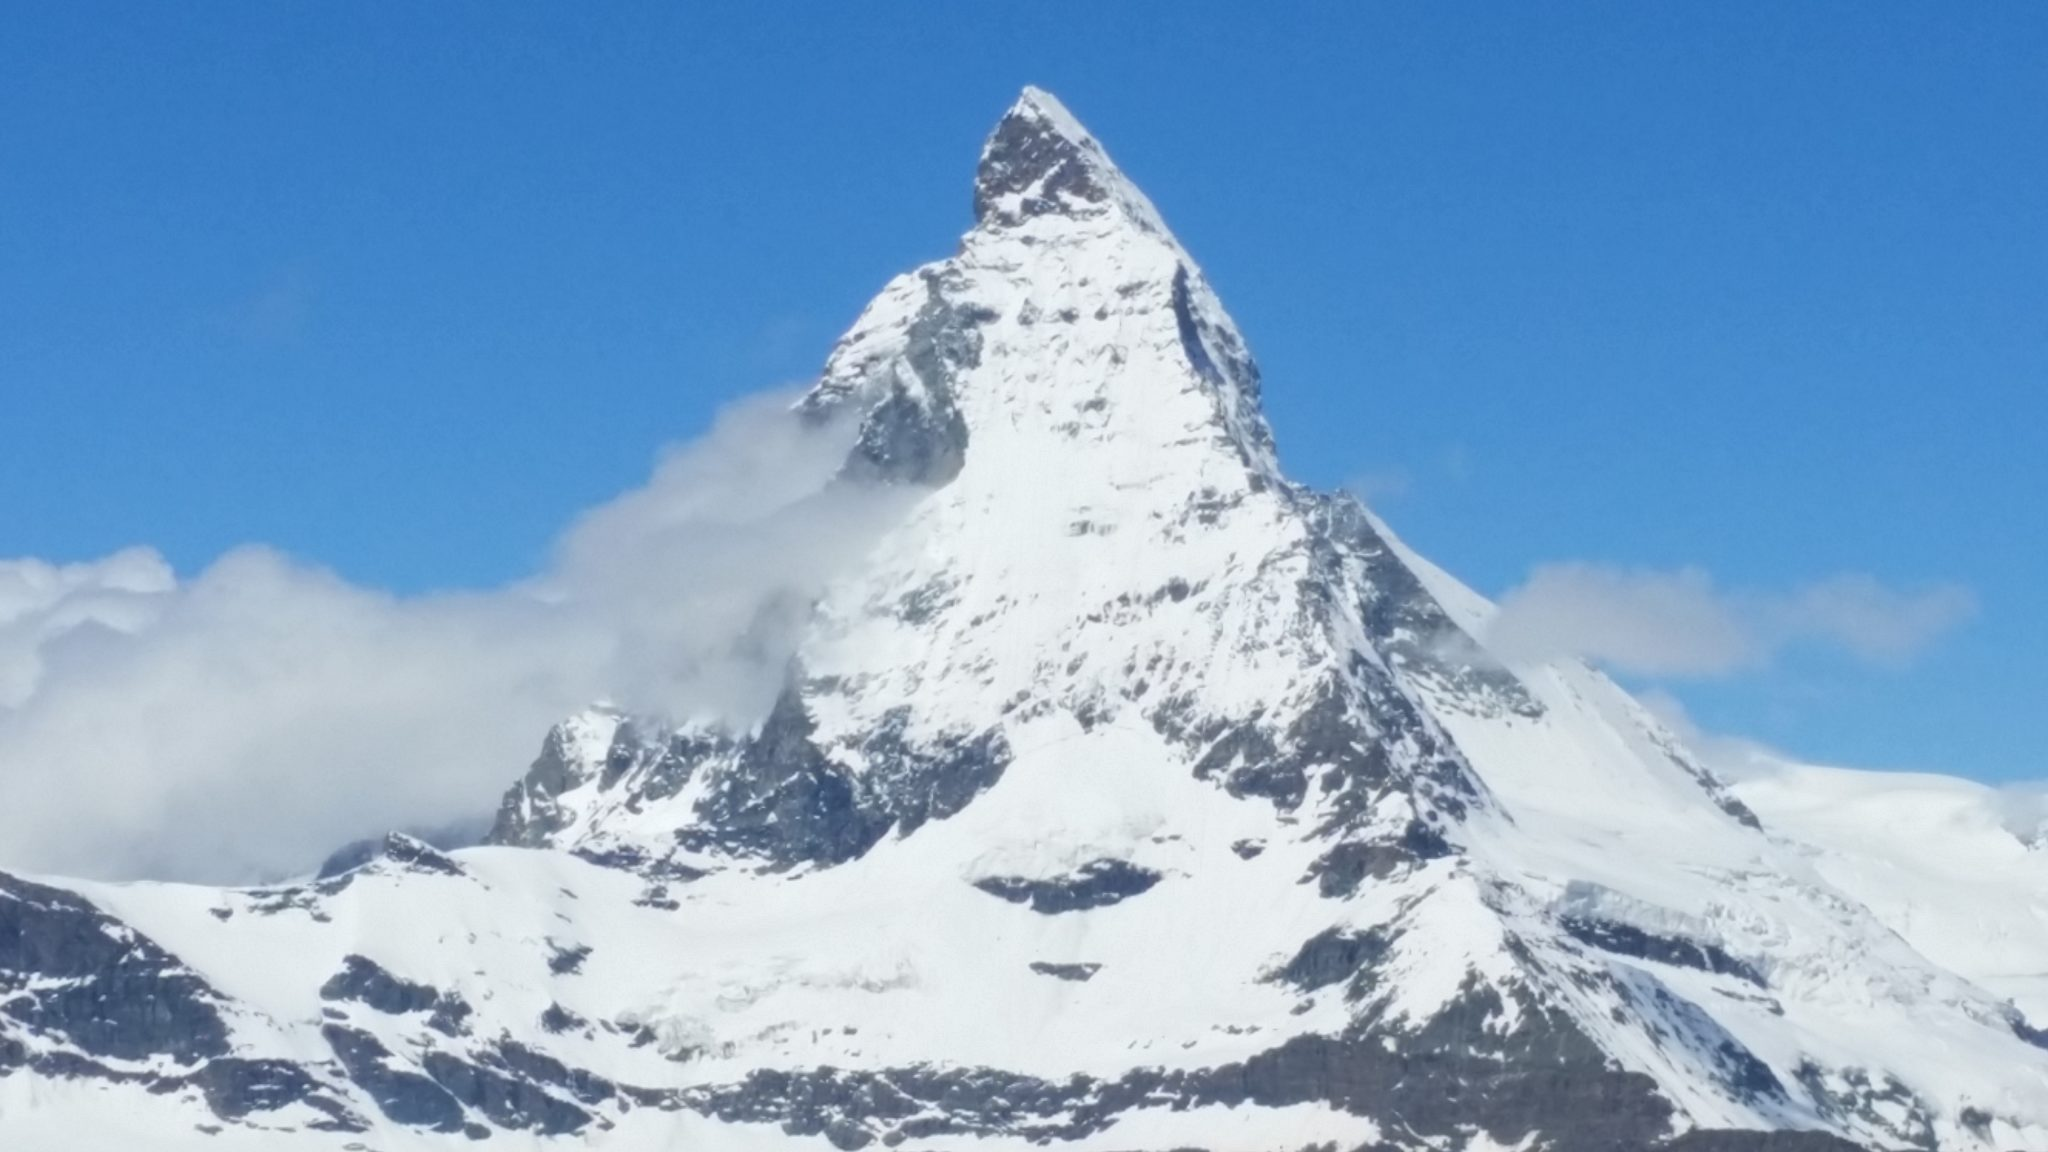 Visiting The Matterhorn, Zermatt, Switzerland in Summer